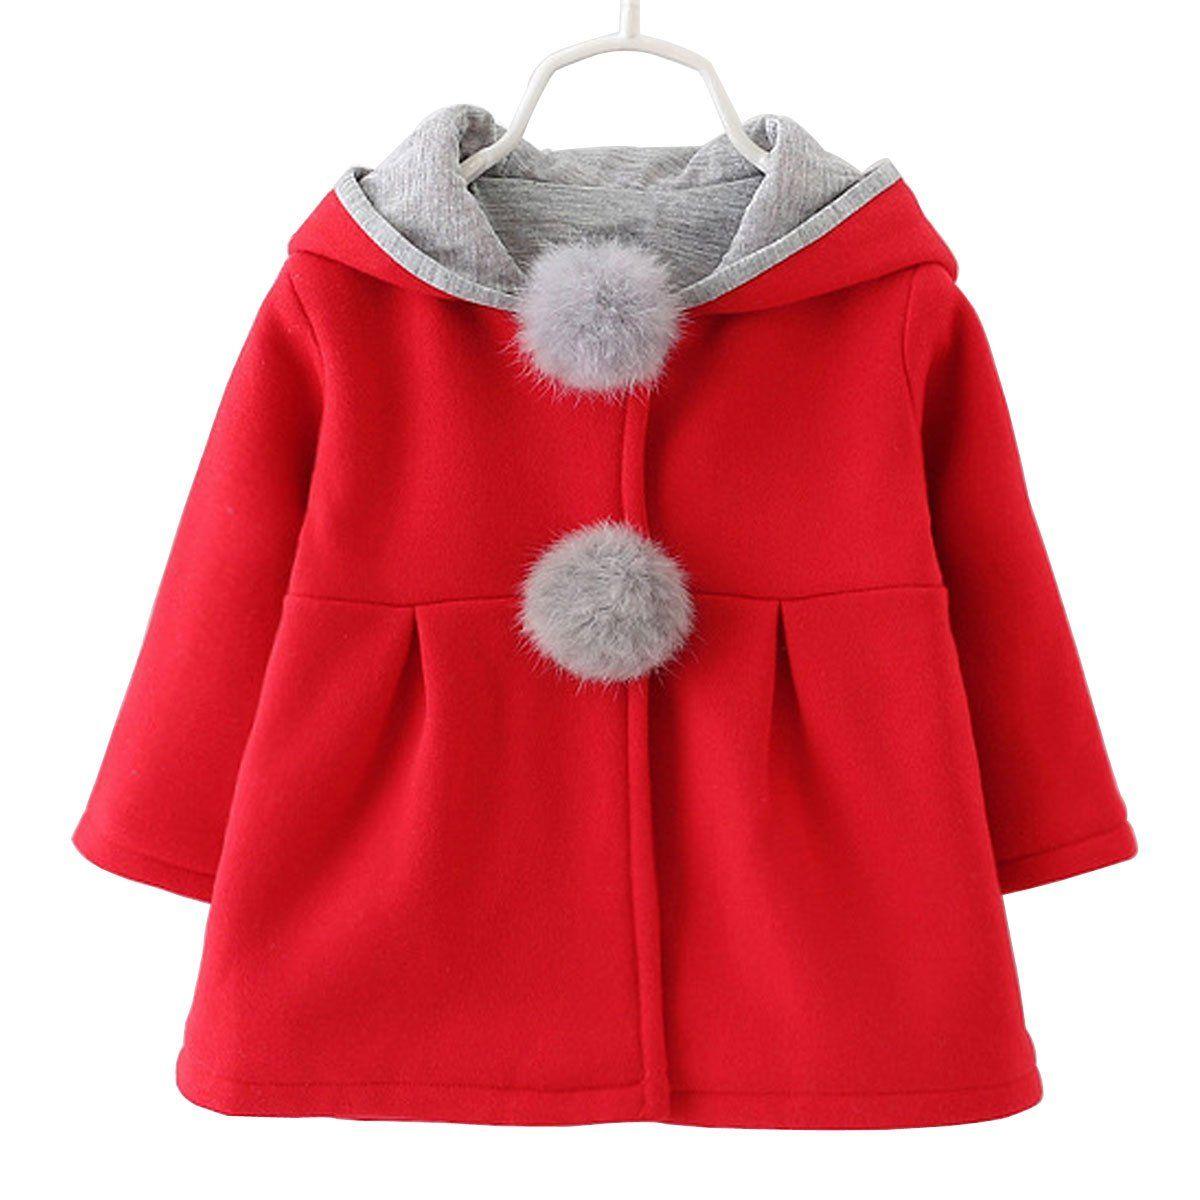 Baby Girls Toddler Kids Winter Big Ears Hoodie Jackets Outerwear